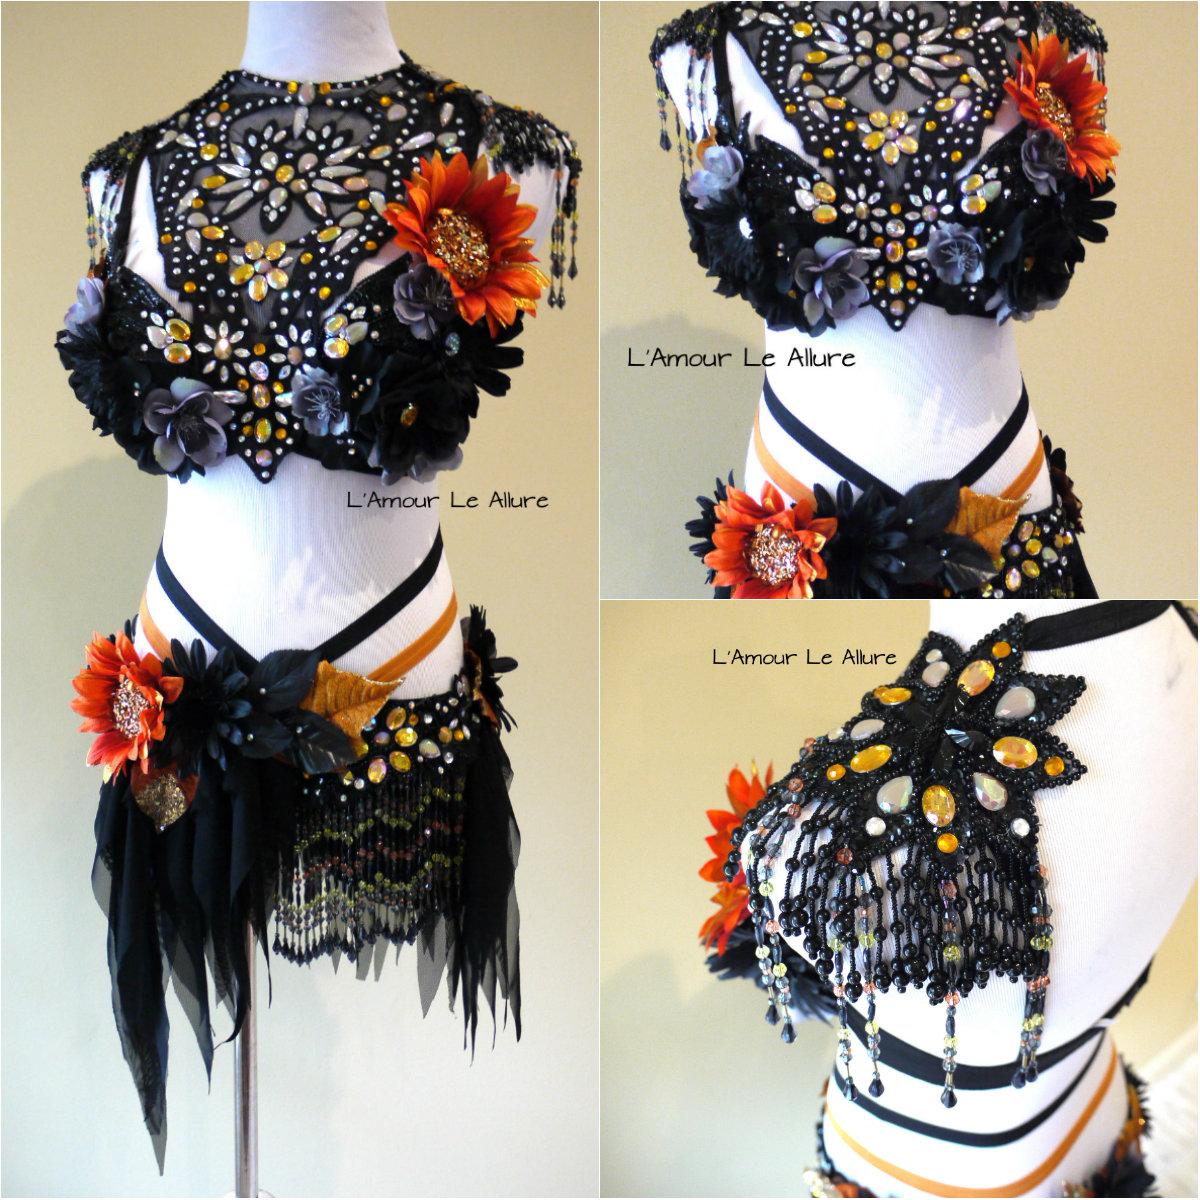 d27908e3cd2fd Dark Orange Halloween Fairy Costume Cosplay Dance Costume Rave Bra on  Storenvy